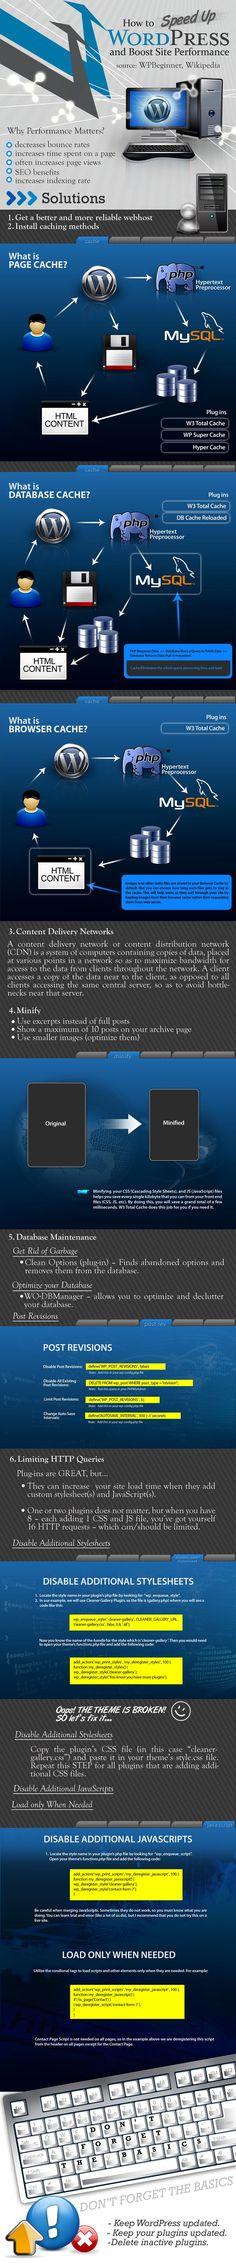 mejorar carga y acelerar wordpress